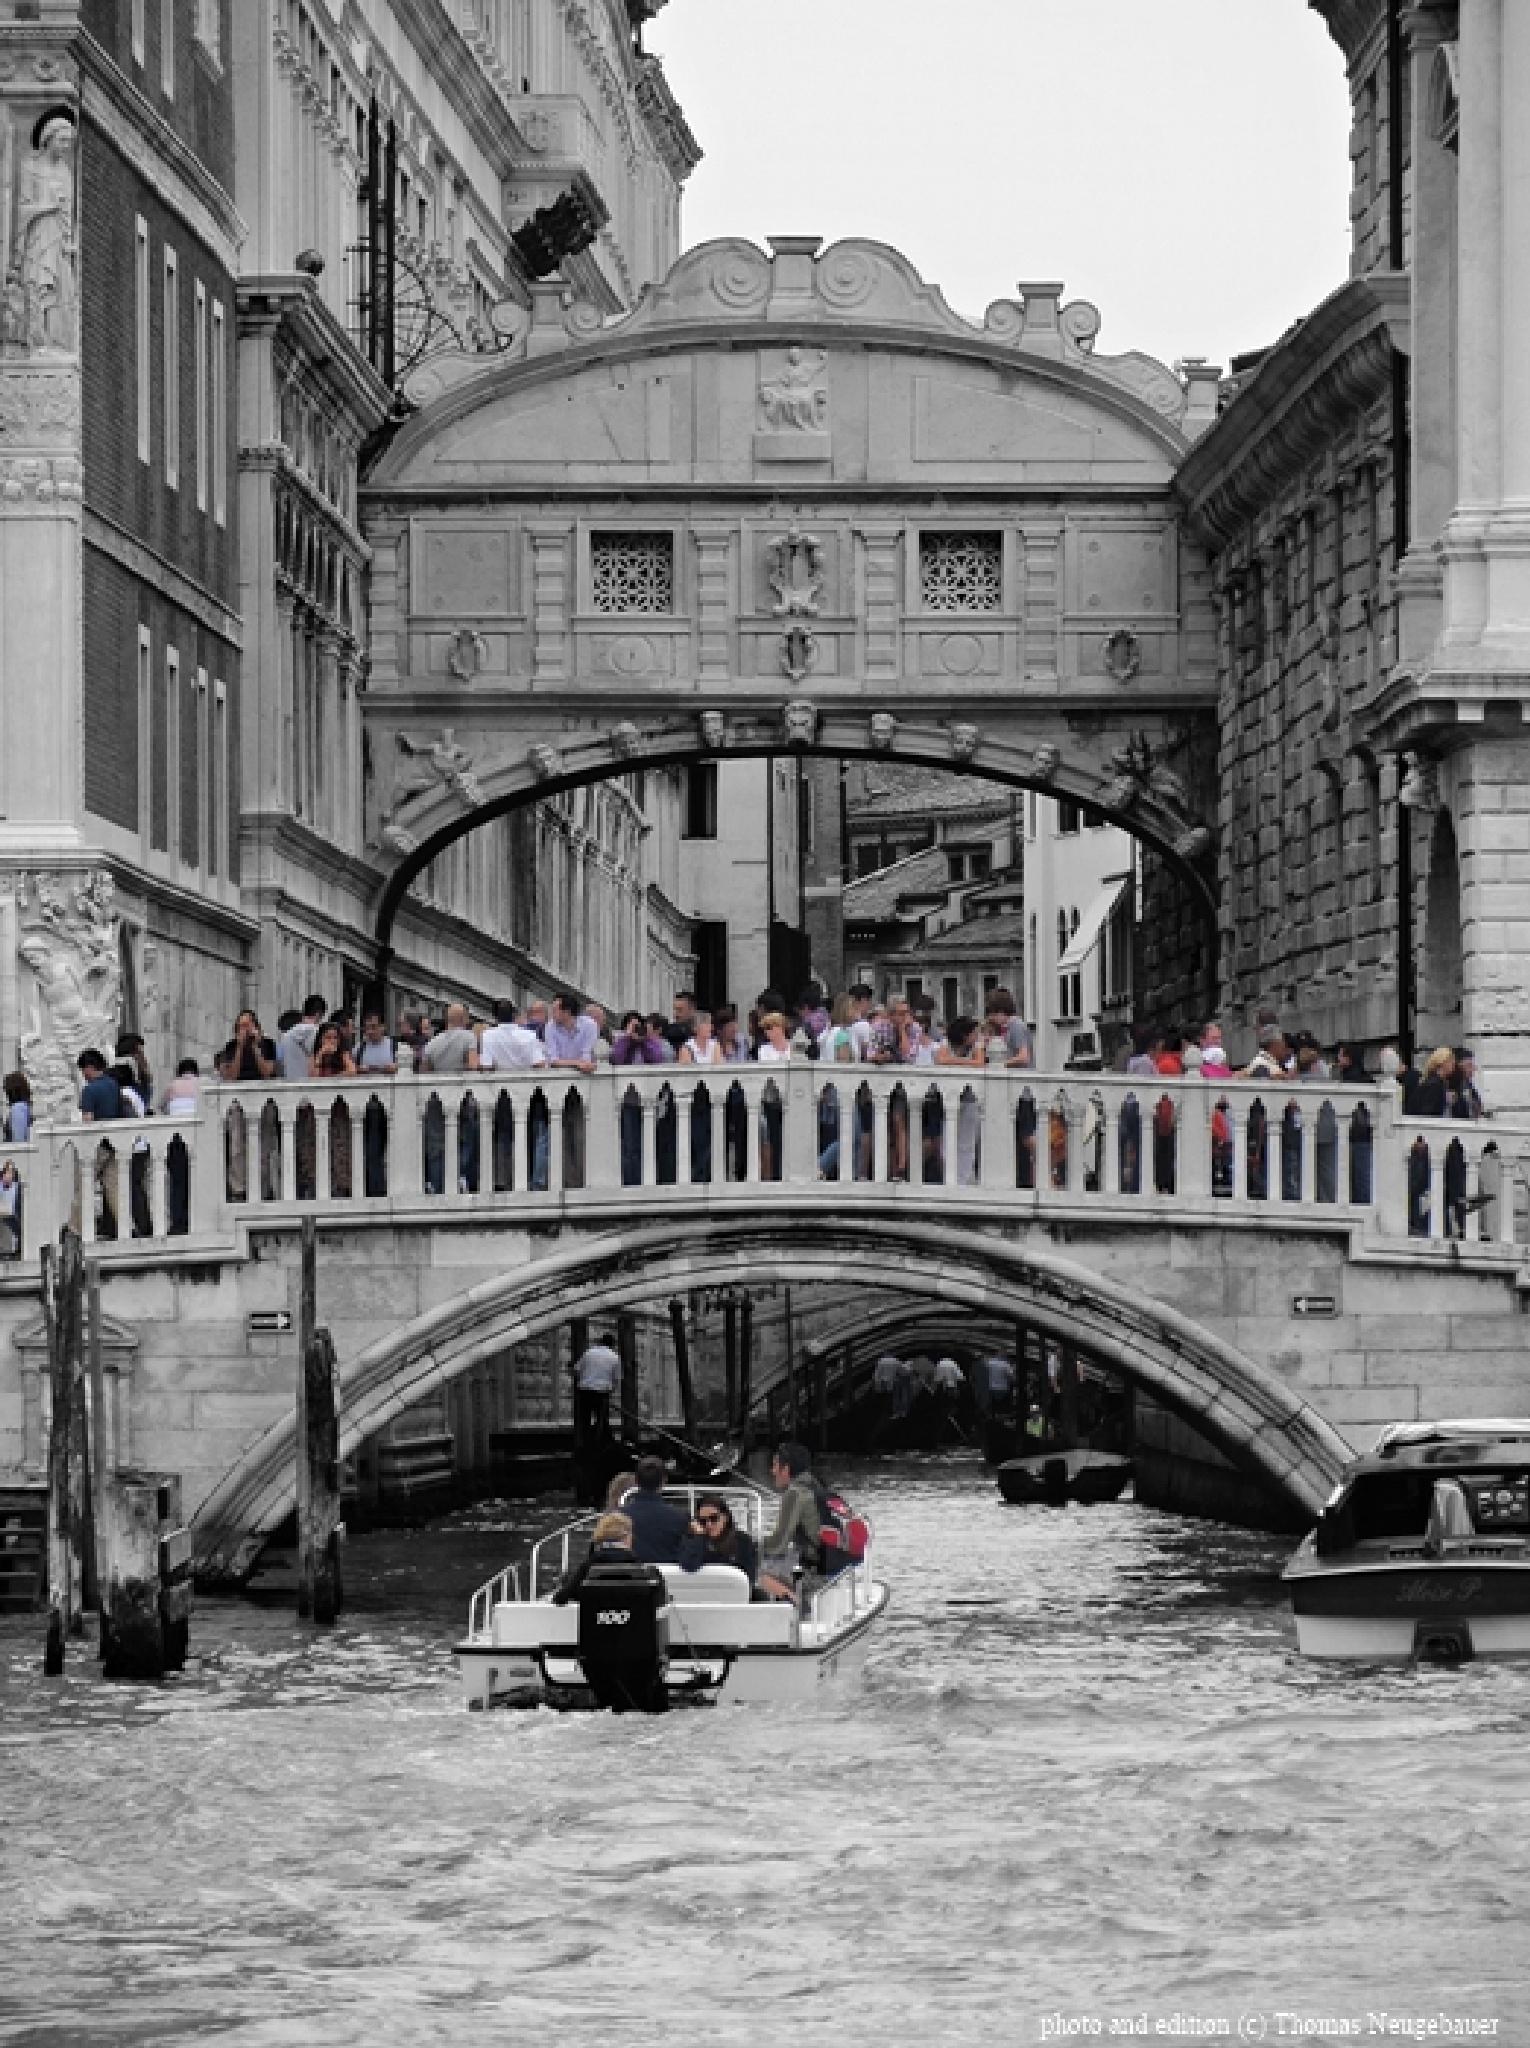 # 548 Venice by Thomas Neugebauer